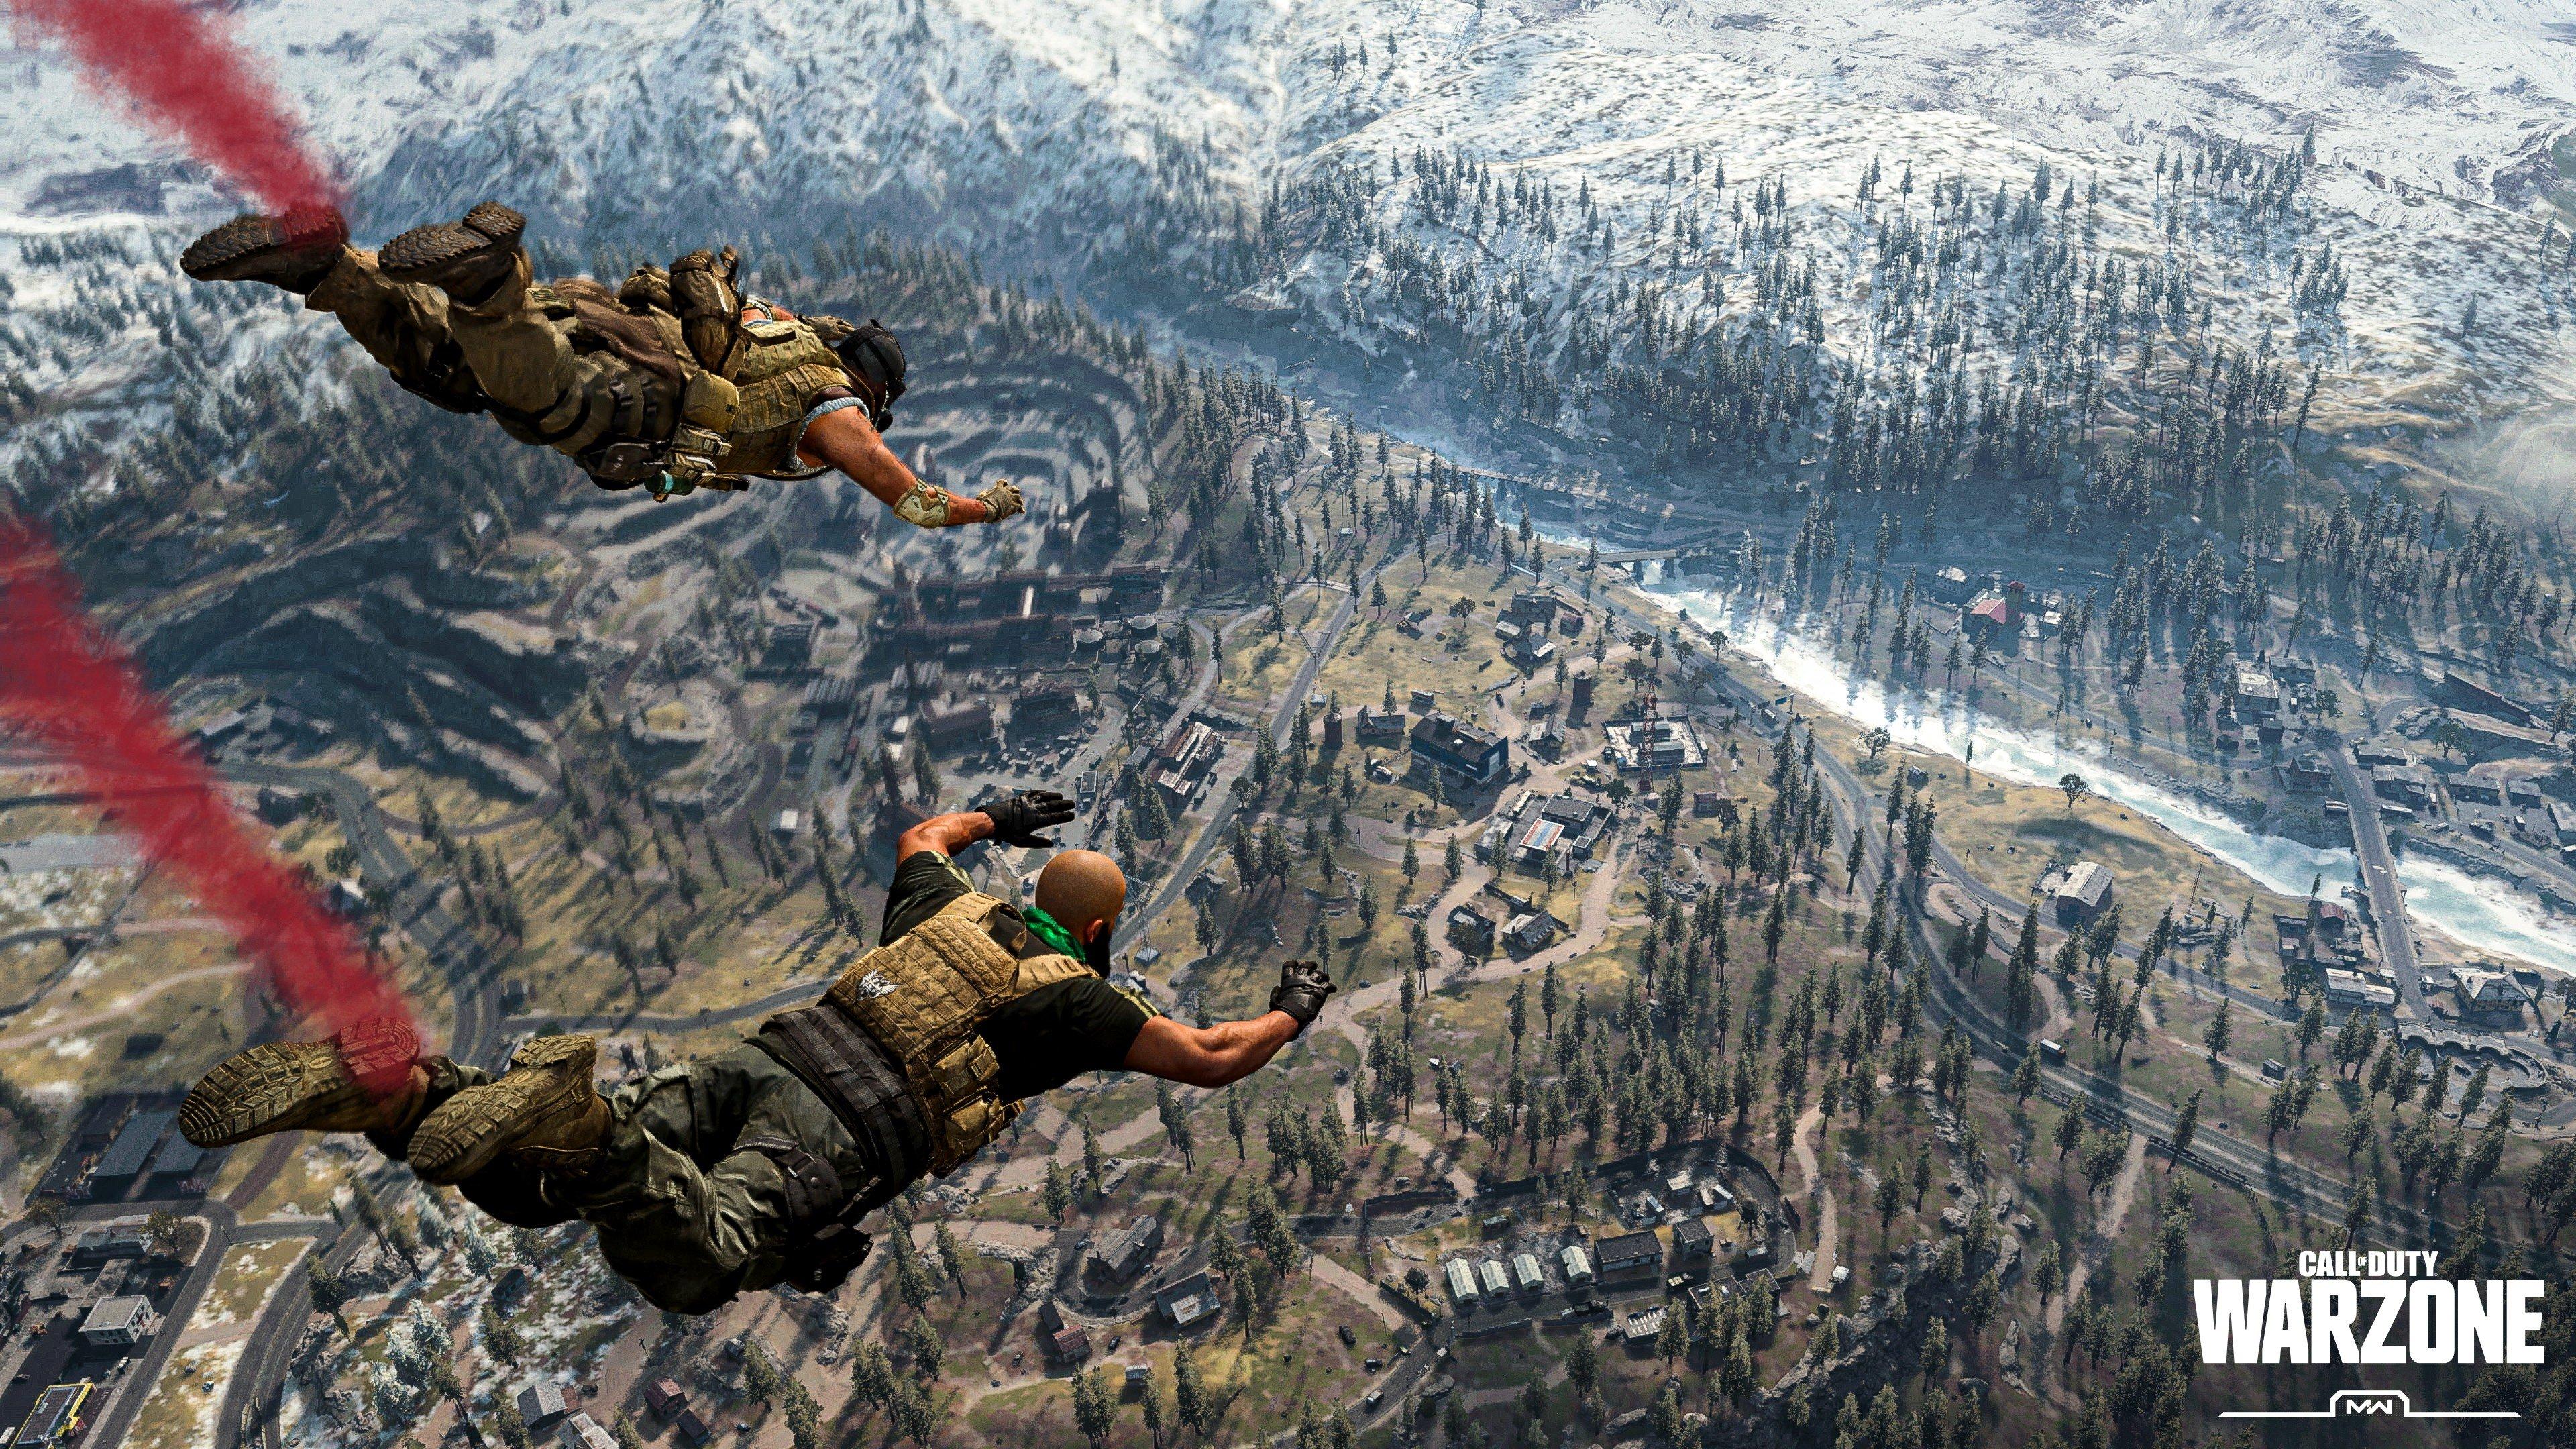 Fondos de pantalla Call of Duty Warzone Skydive